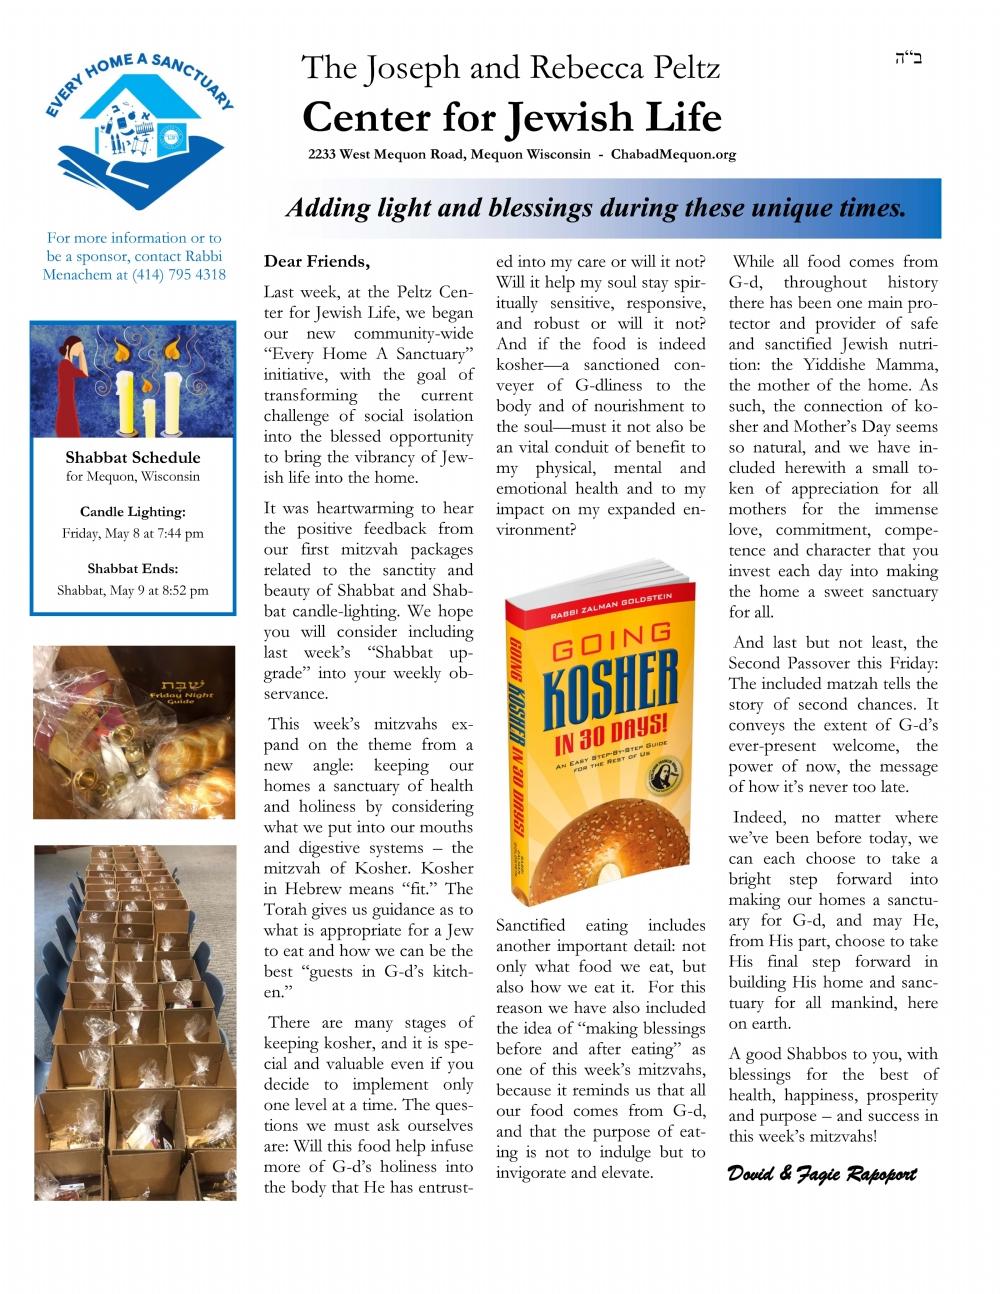 image news 2_Page_1.jpg